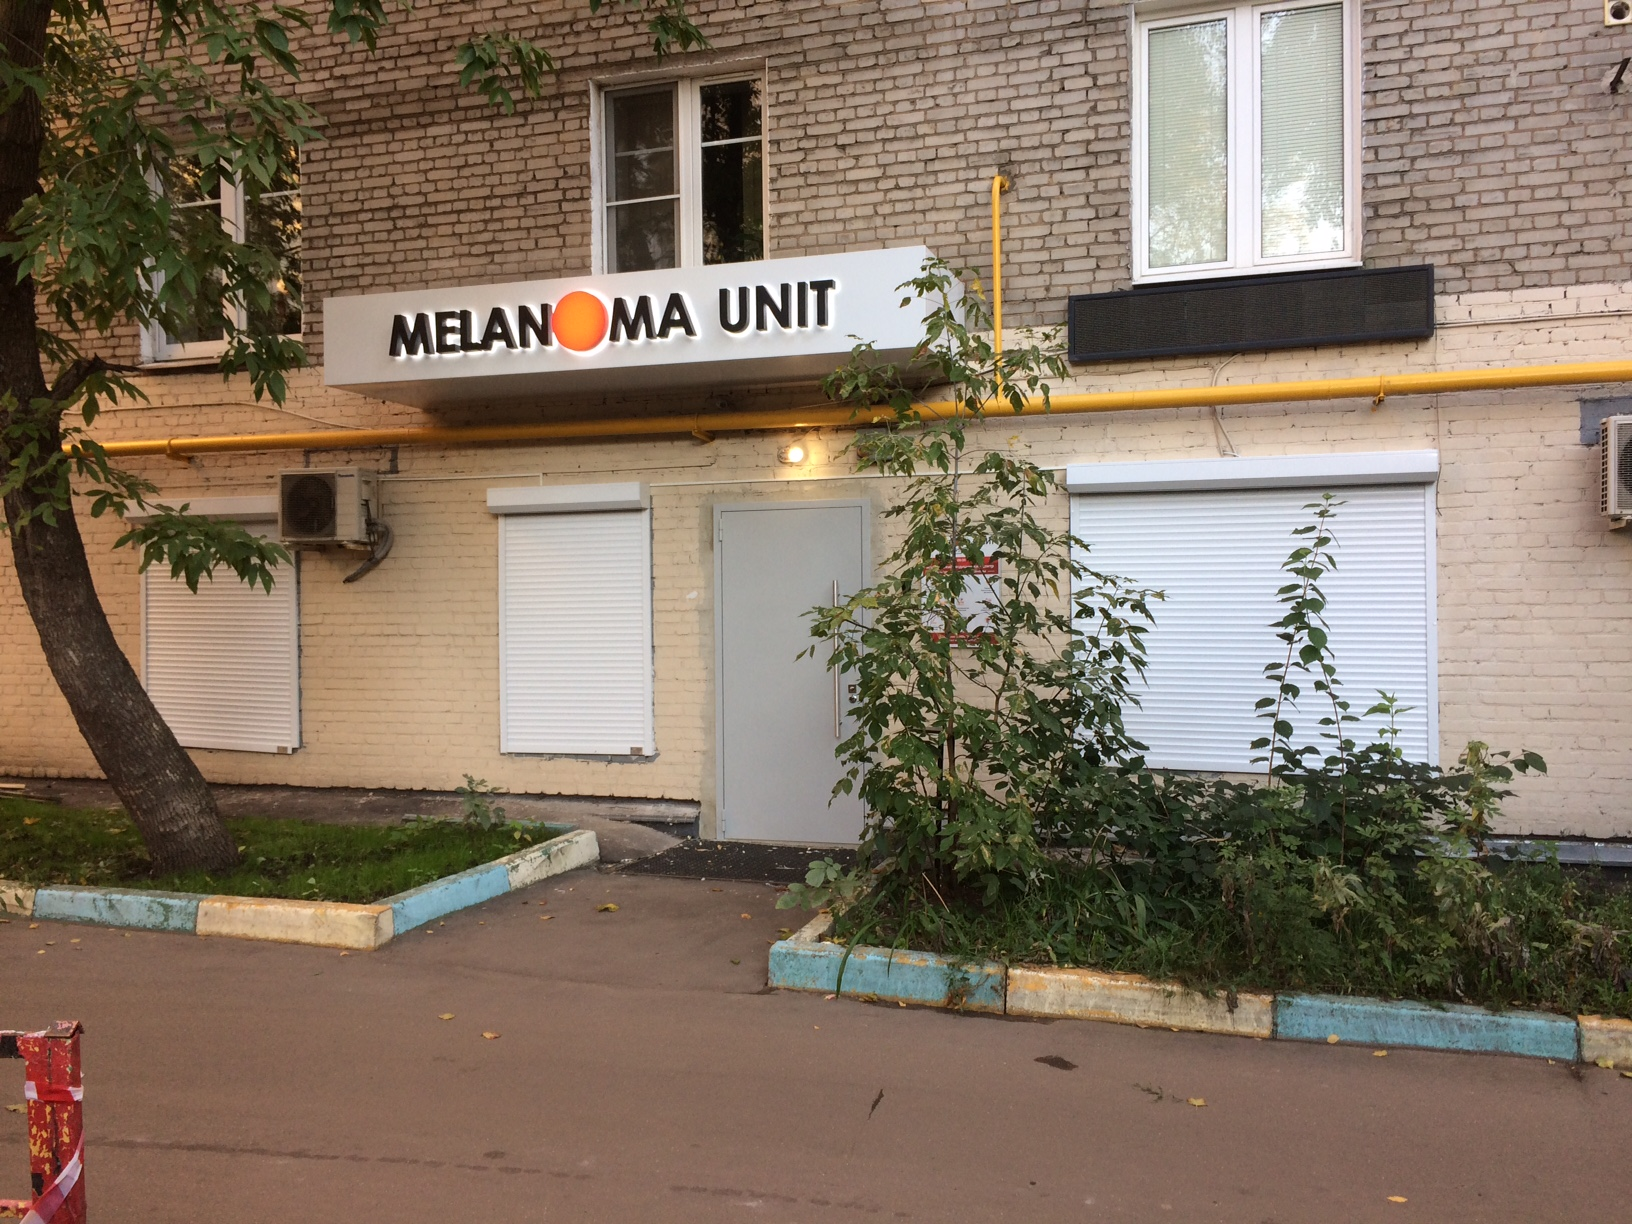 Москва. Клиника МеланомаЮнит